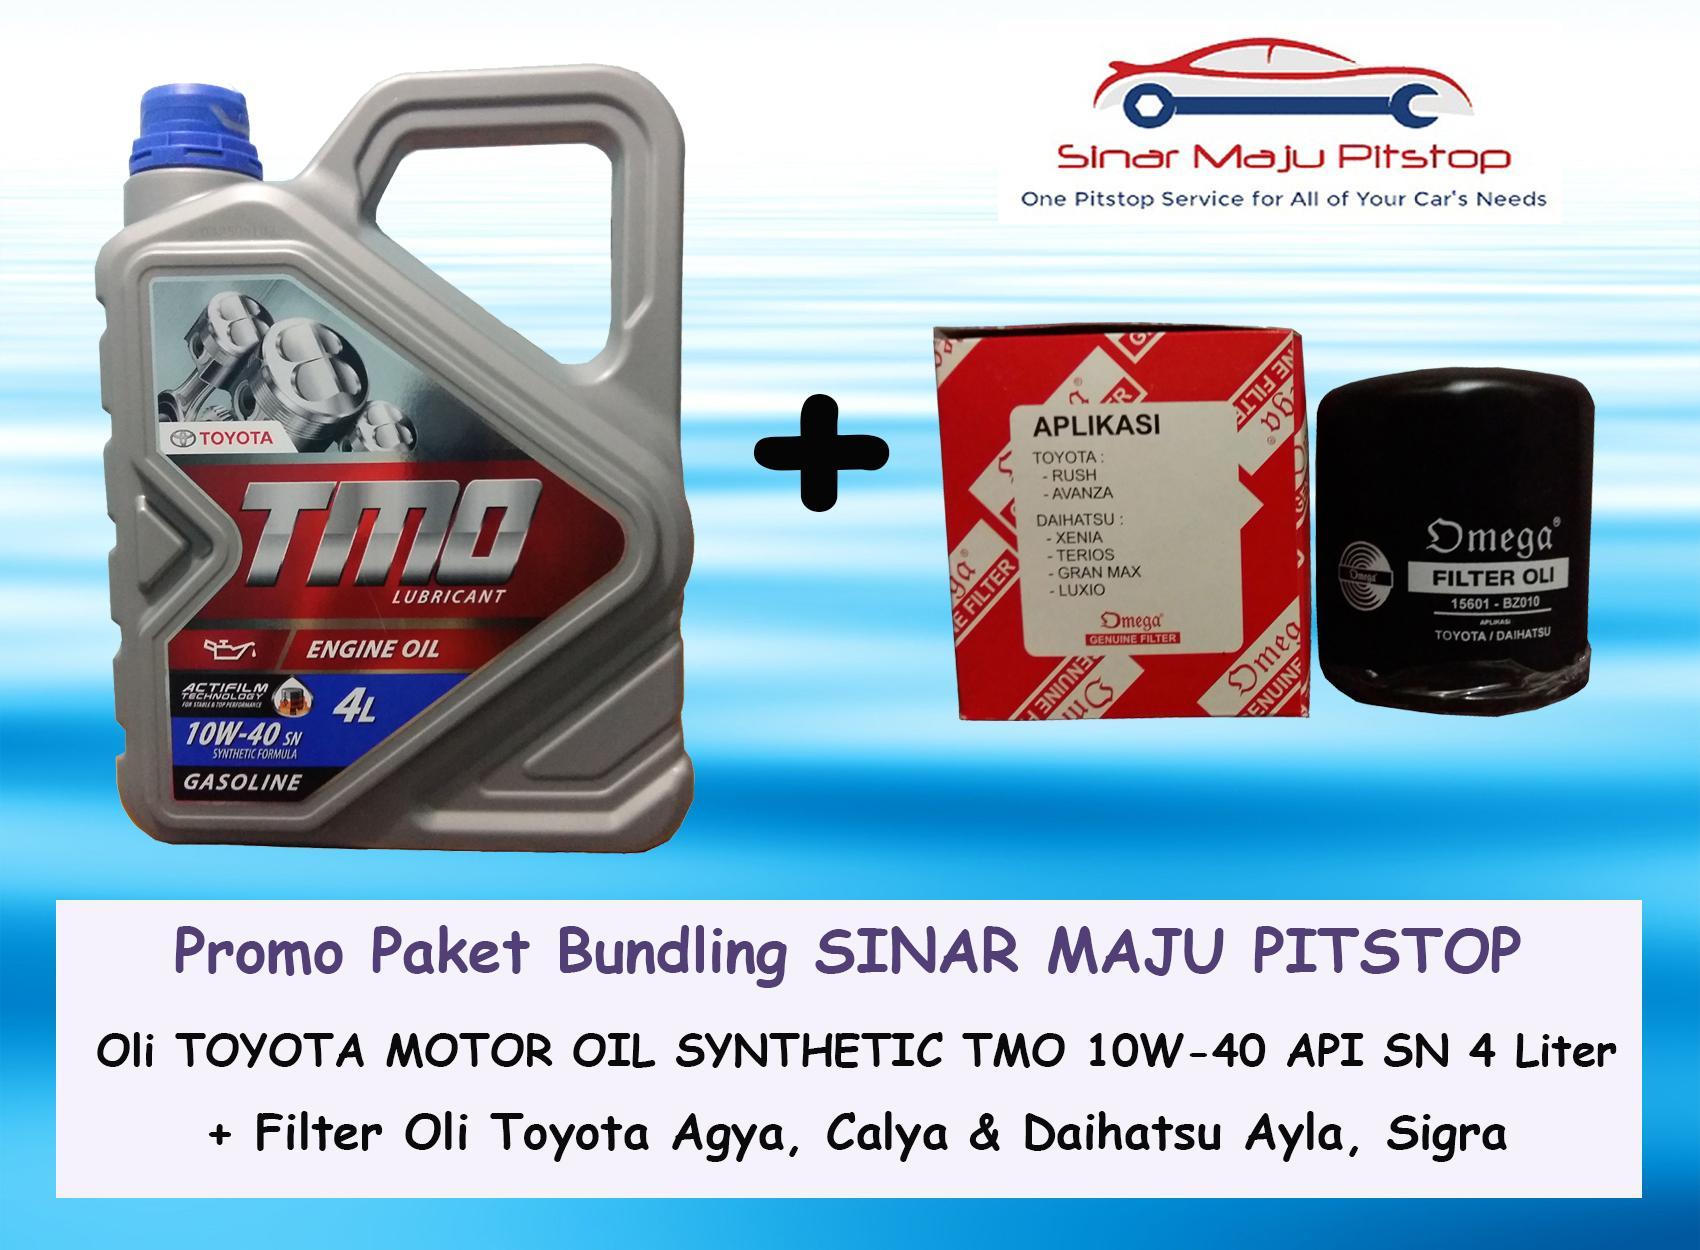 PROMO Paket Bundling Oli Mobil TMO TOYOTA MOTOR OIL 10W-40 API SN 4 LITER & Filter Oli Mobil DAIHATSU SIGRA AYLA & TOYOTA CALYA AGYA